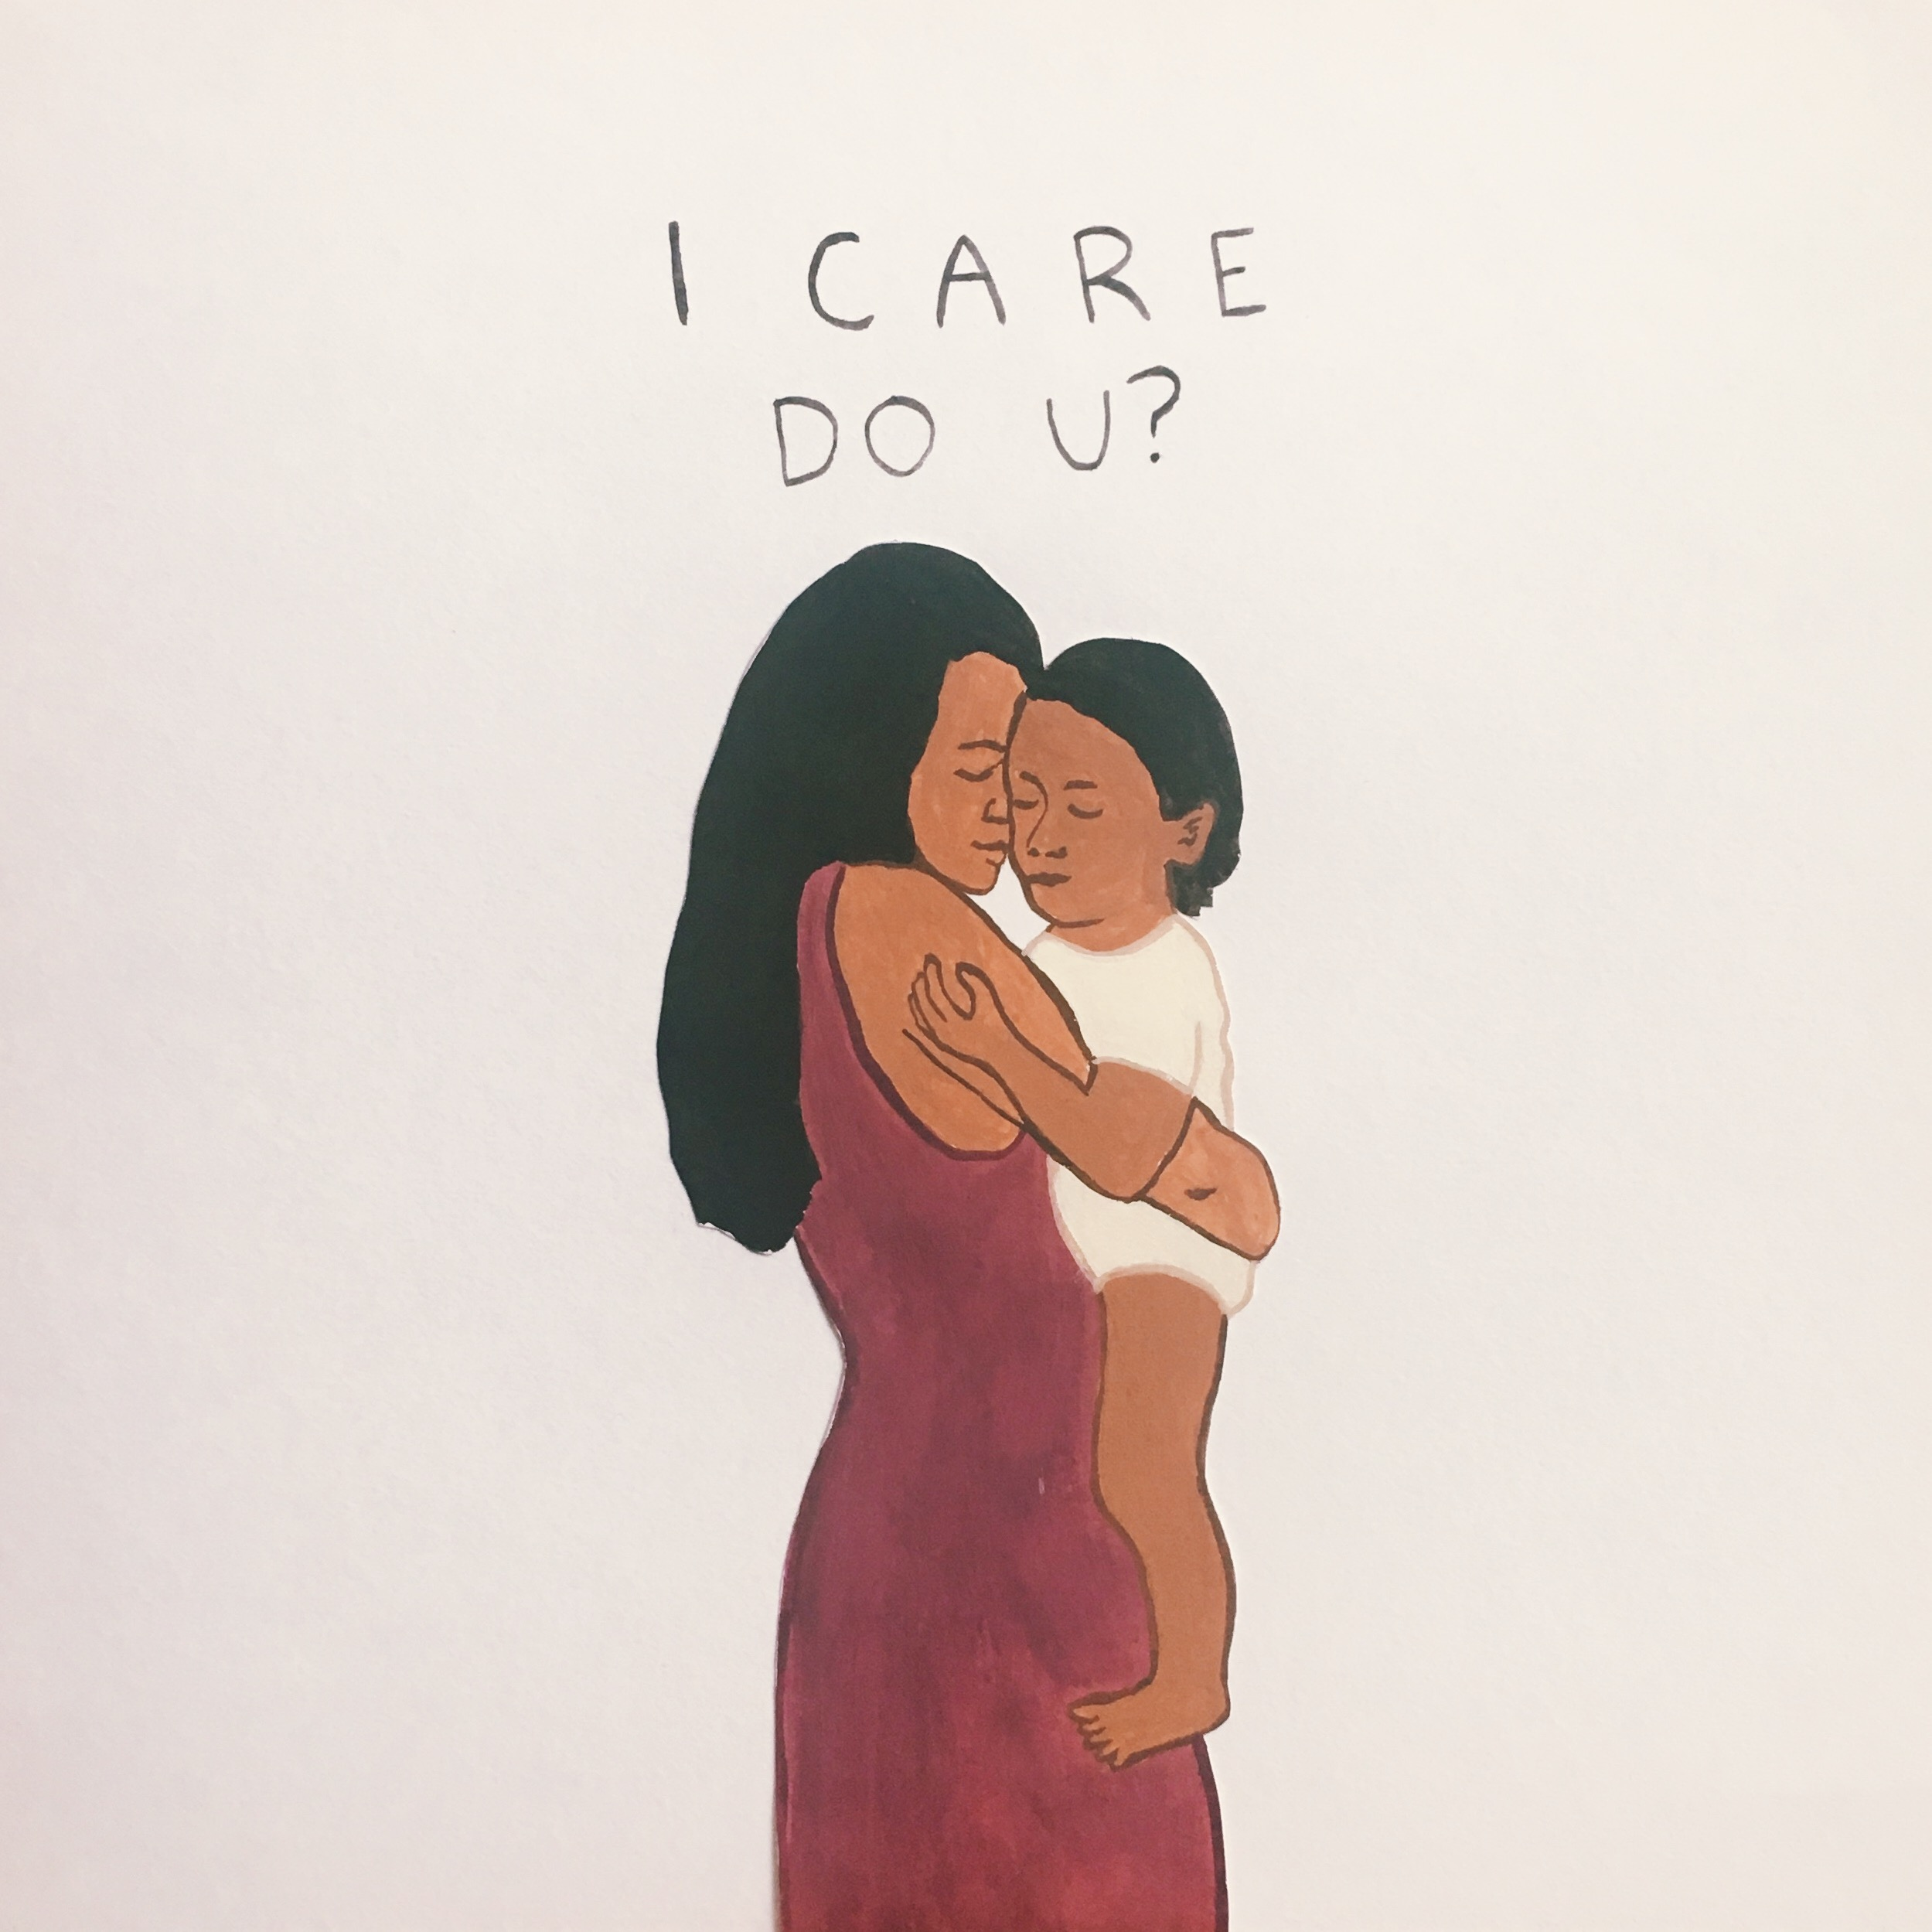 I Care by Alela Diane